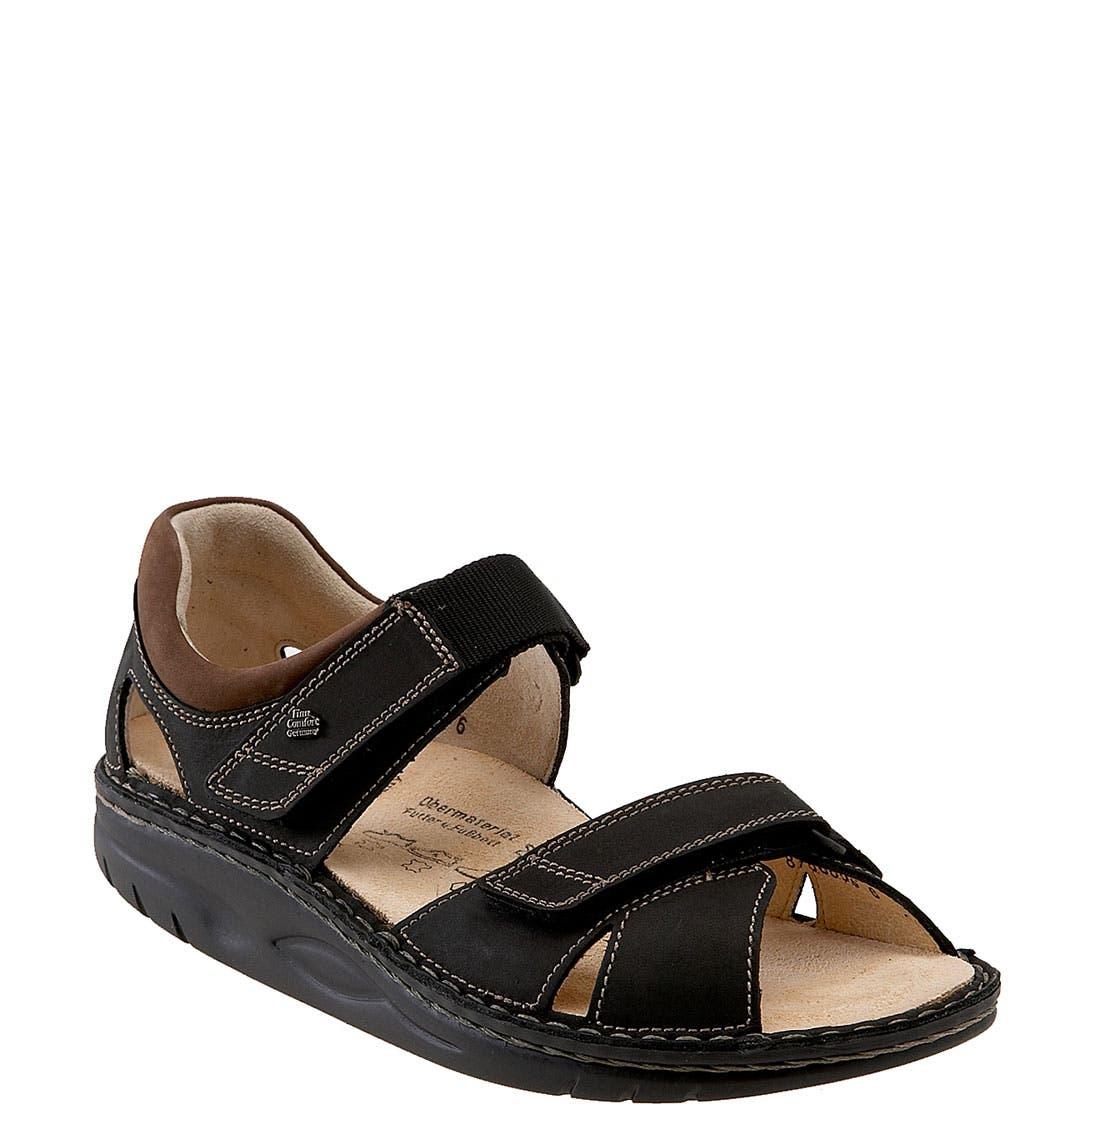 FINNAMIC by Finn Comfort 'Samara' Walking Sandal,                             Main thumbnail 1, color,                             BLACK/ HAVANA